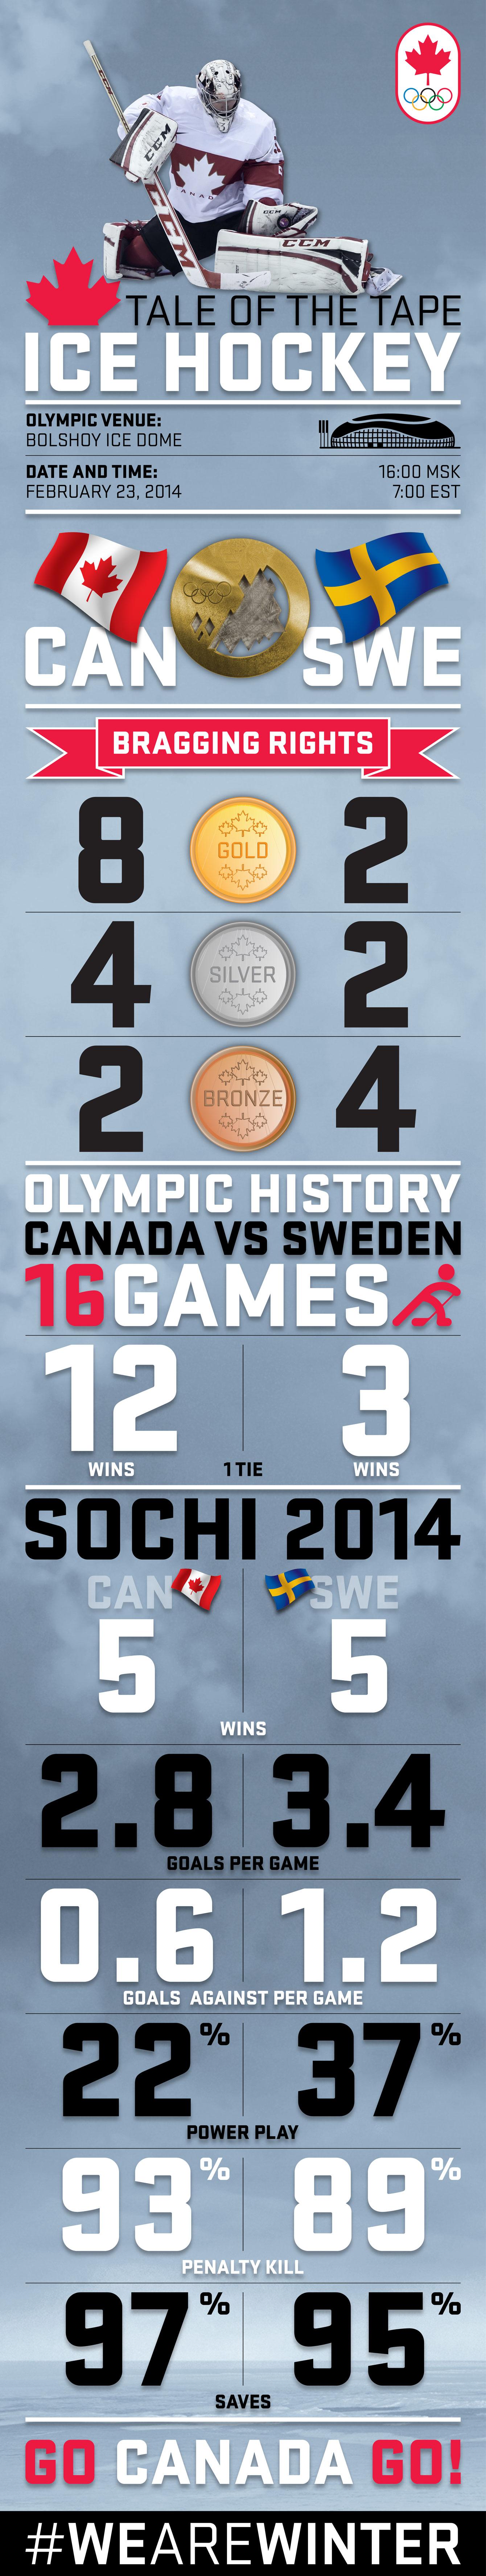 infographic_hockey_taleofthetape_Artboard2 (1)